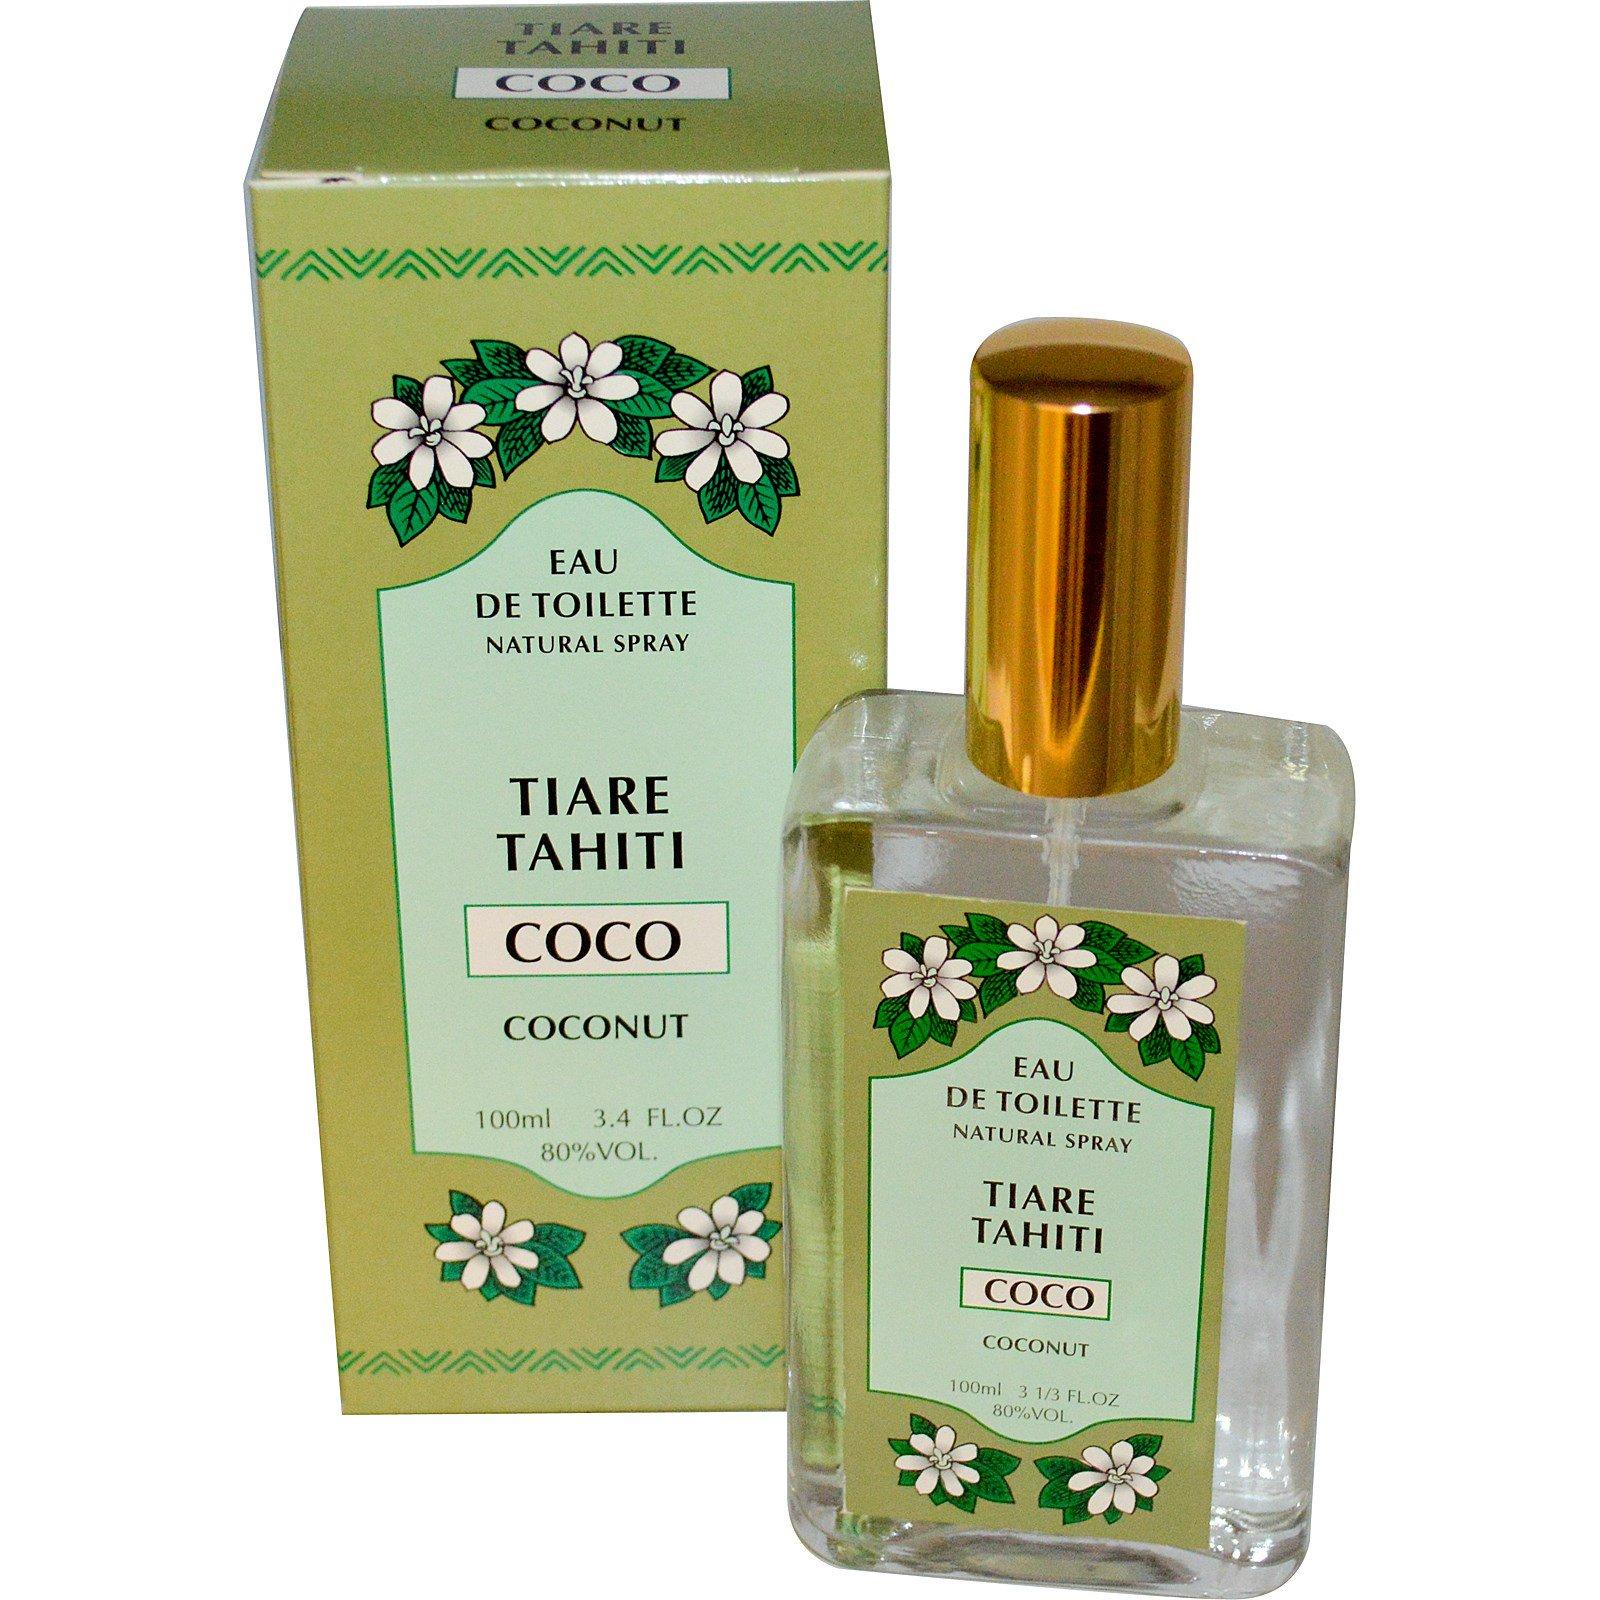 De 4 Monoi TahitiEau Fl Tiare ToiletteperfumeSprayCoconut3 v0OmN8nw